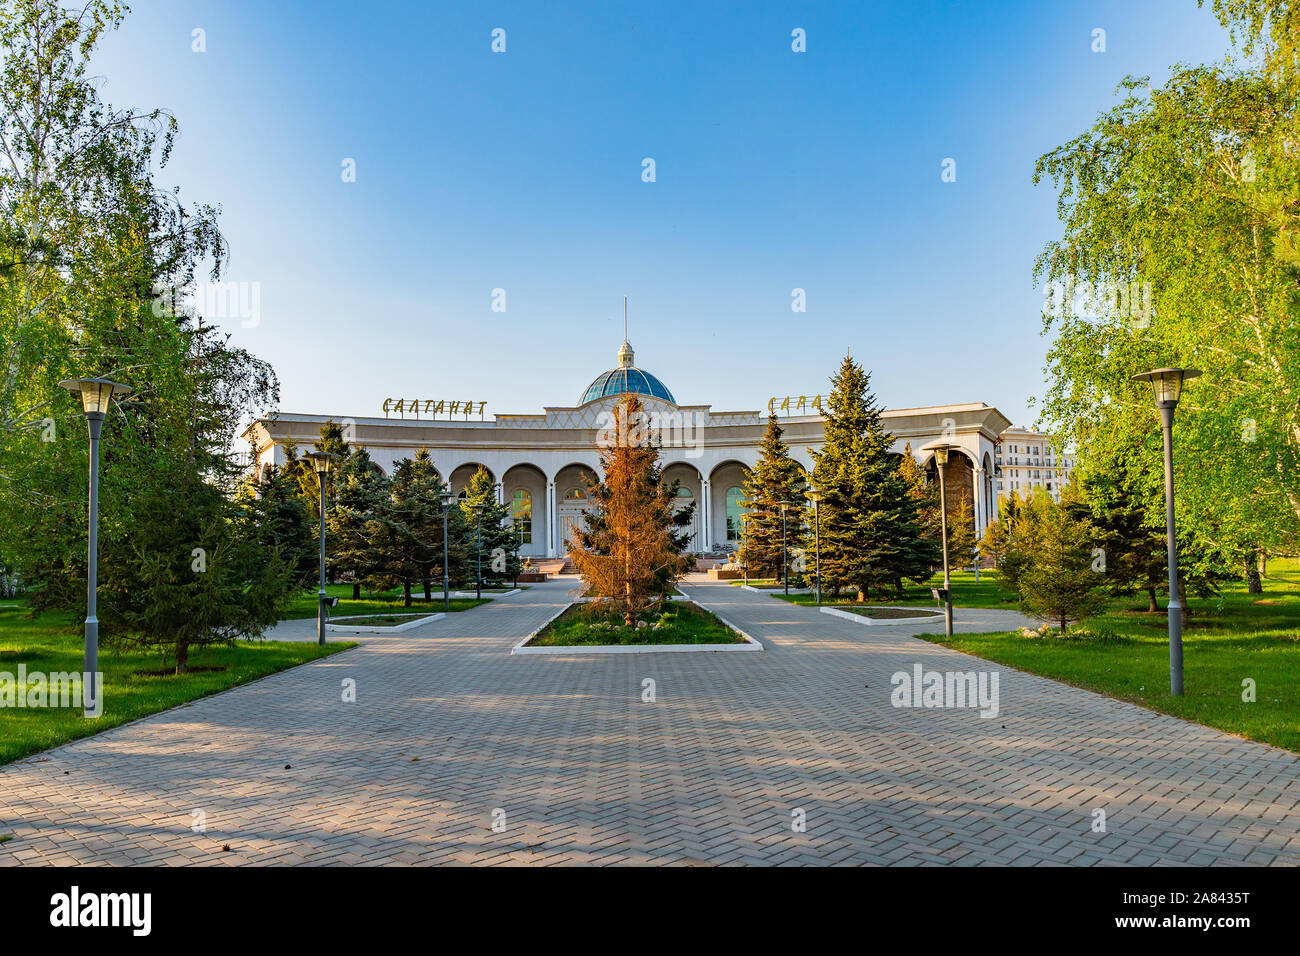 Nur-Sultan Astana Central City Tsentralnyy Gorodskoy Park View of Saltanat Sarayy Building on a Sunny Blue Sky Day Stock Photo